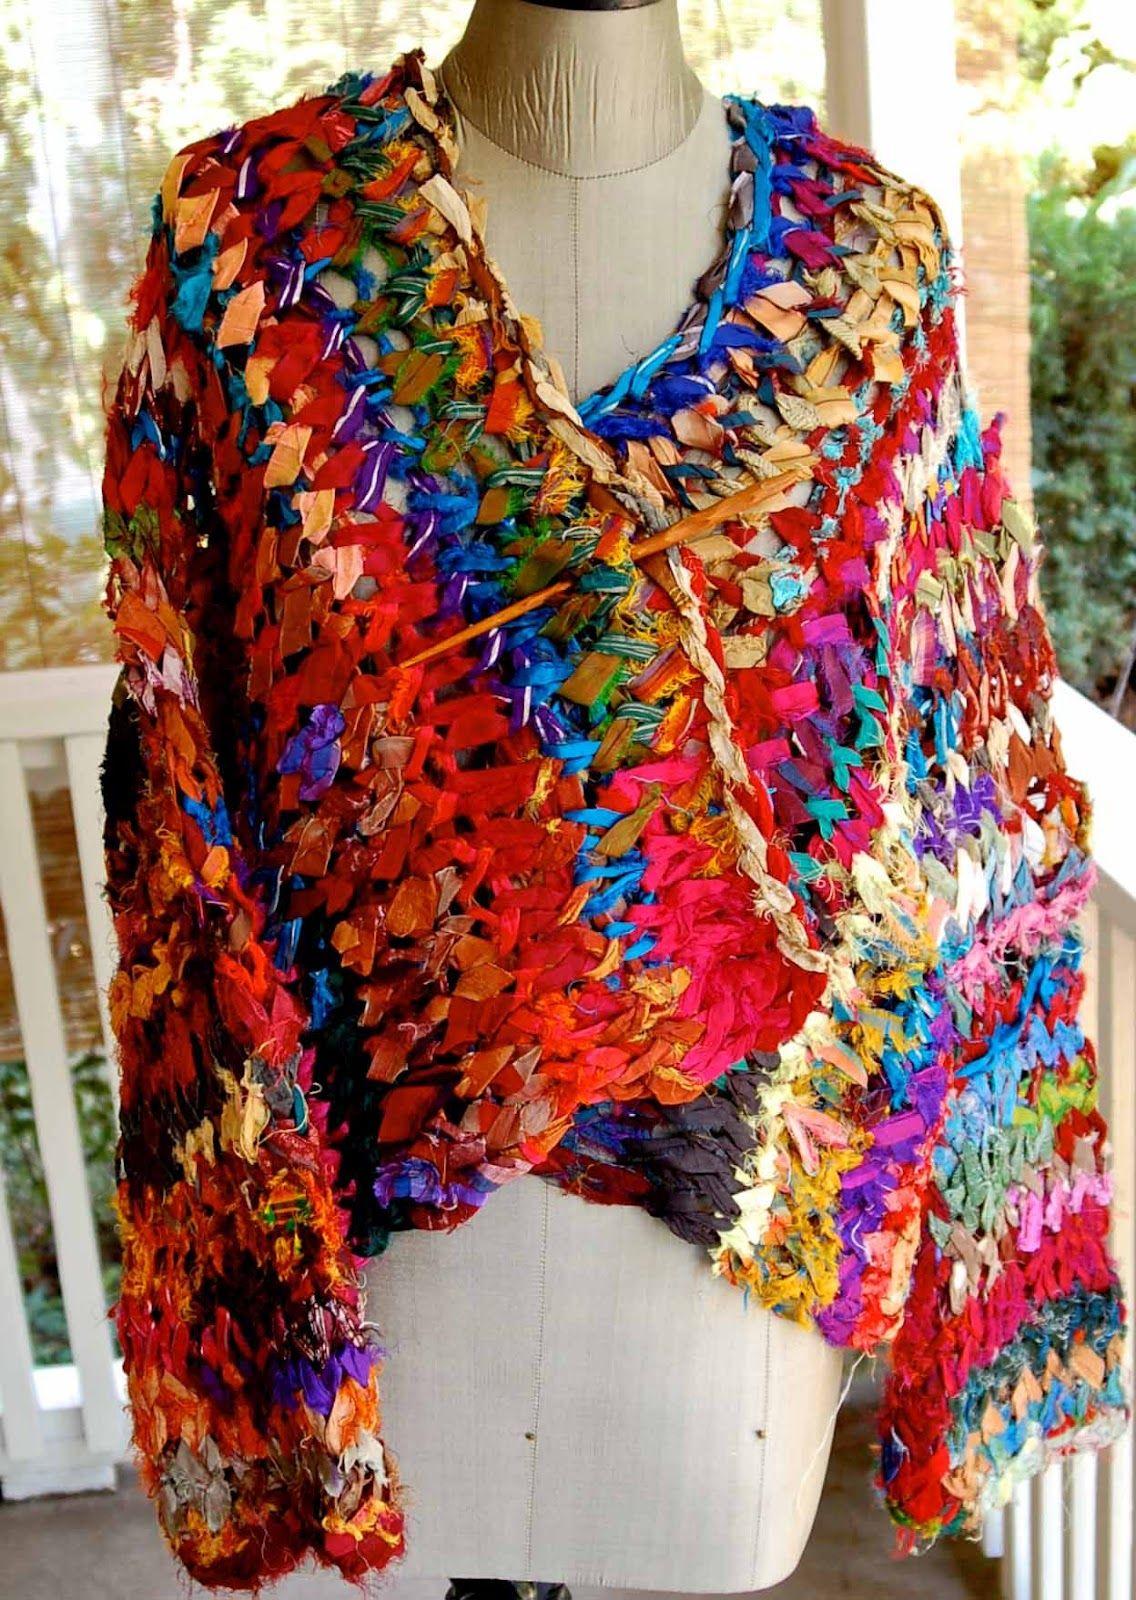 Sari silk ribbon project k n i t pinterest ribbon projects ravelry peruvian sari silk ribbon jacket pattern by cheryl oberle bankloansurffo Gallery